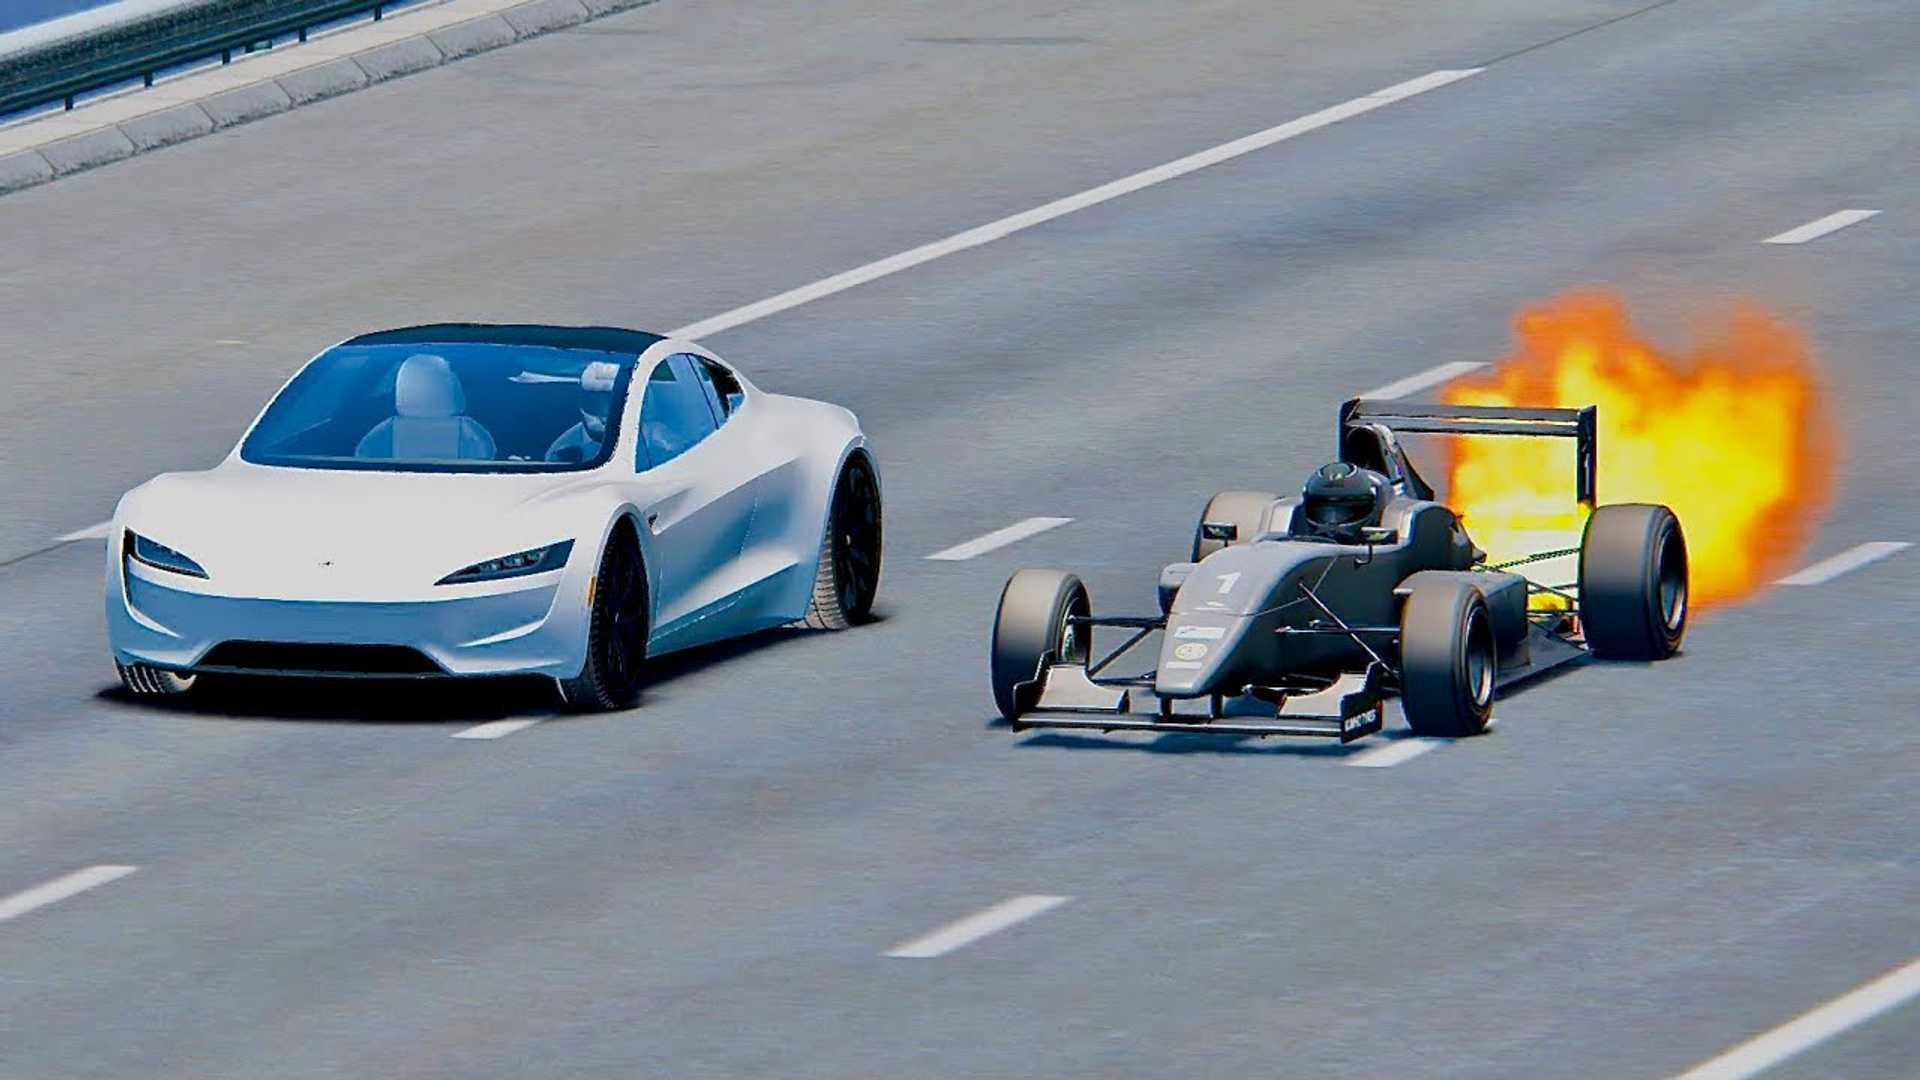 Watch Tesla Roadster Race Jet Engine Formula 1 Car Simulated Video